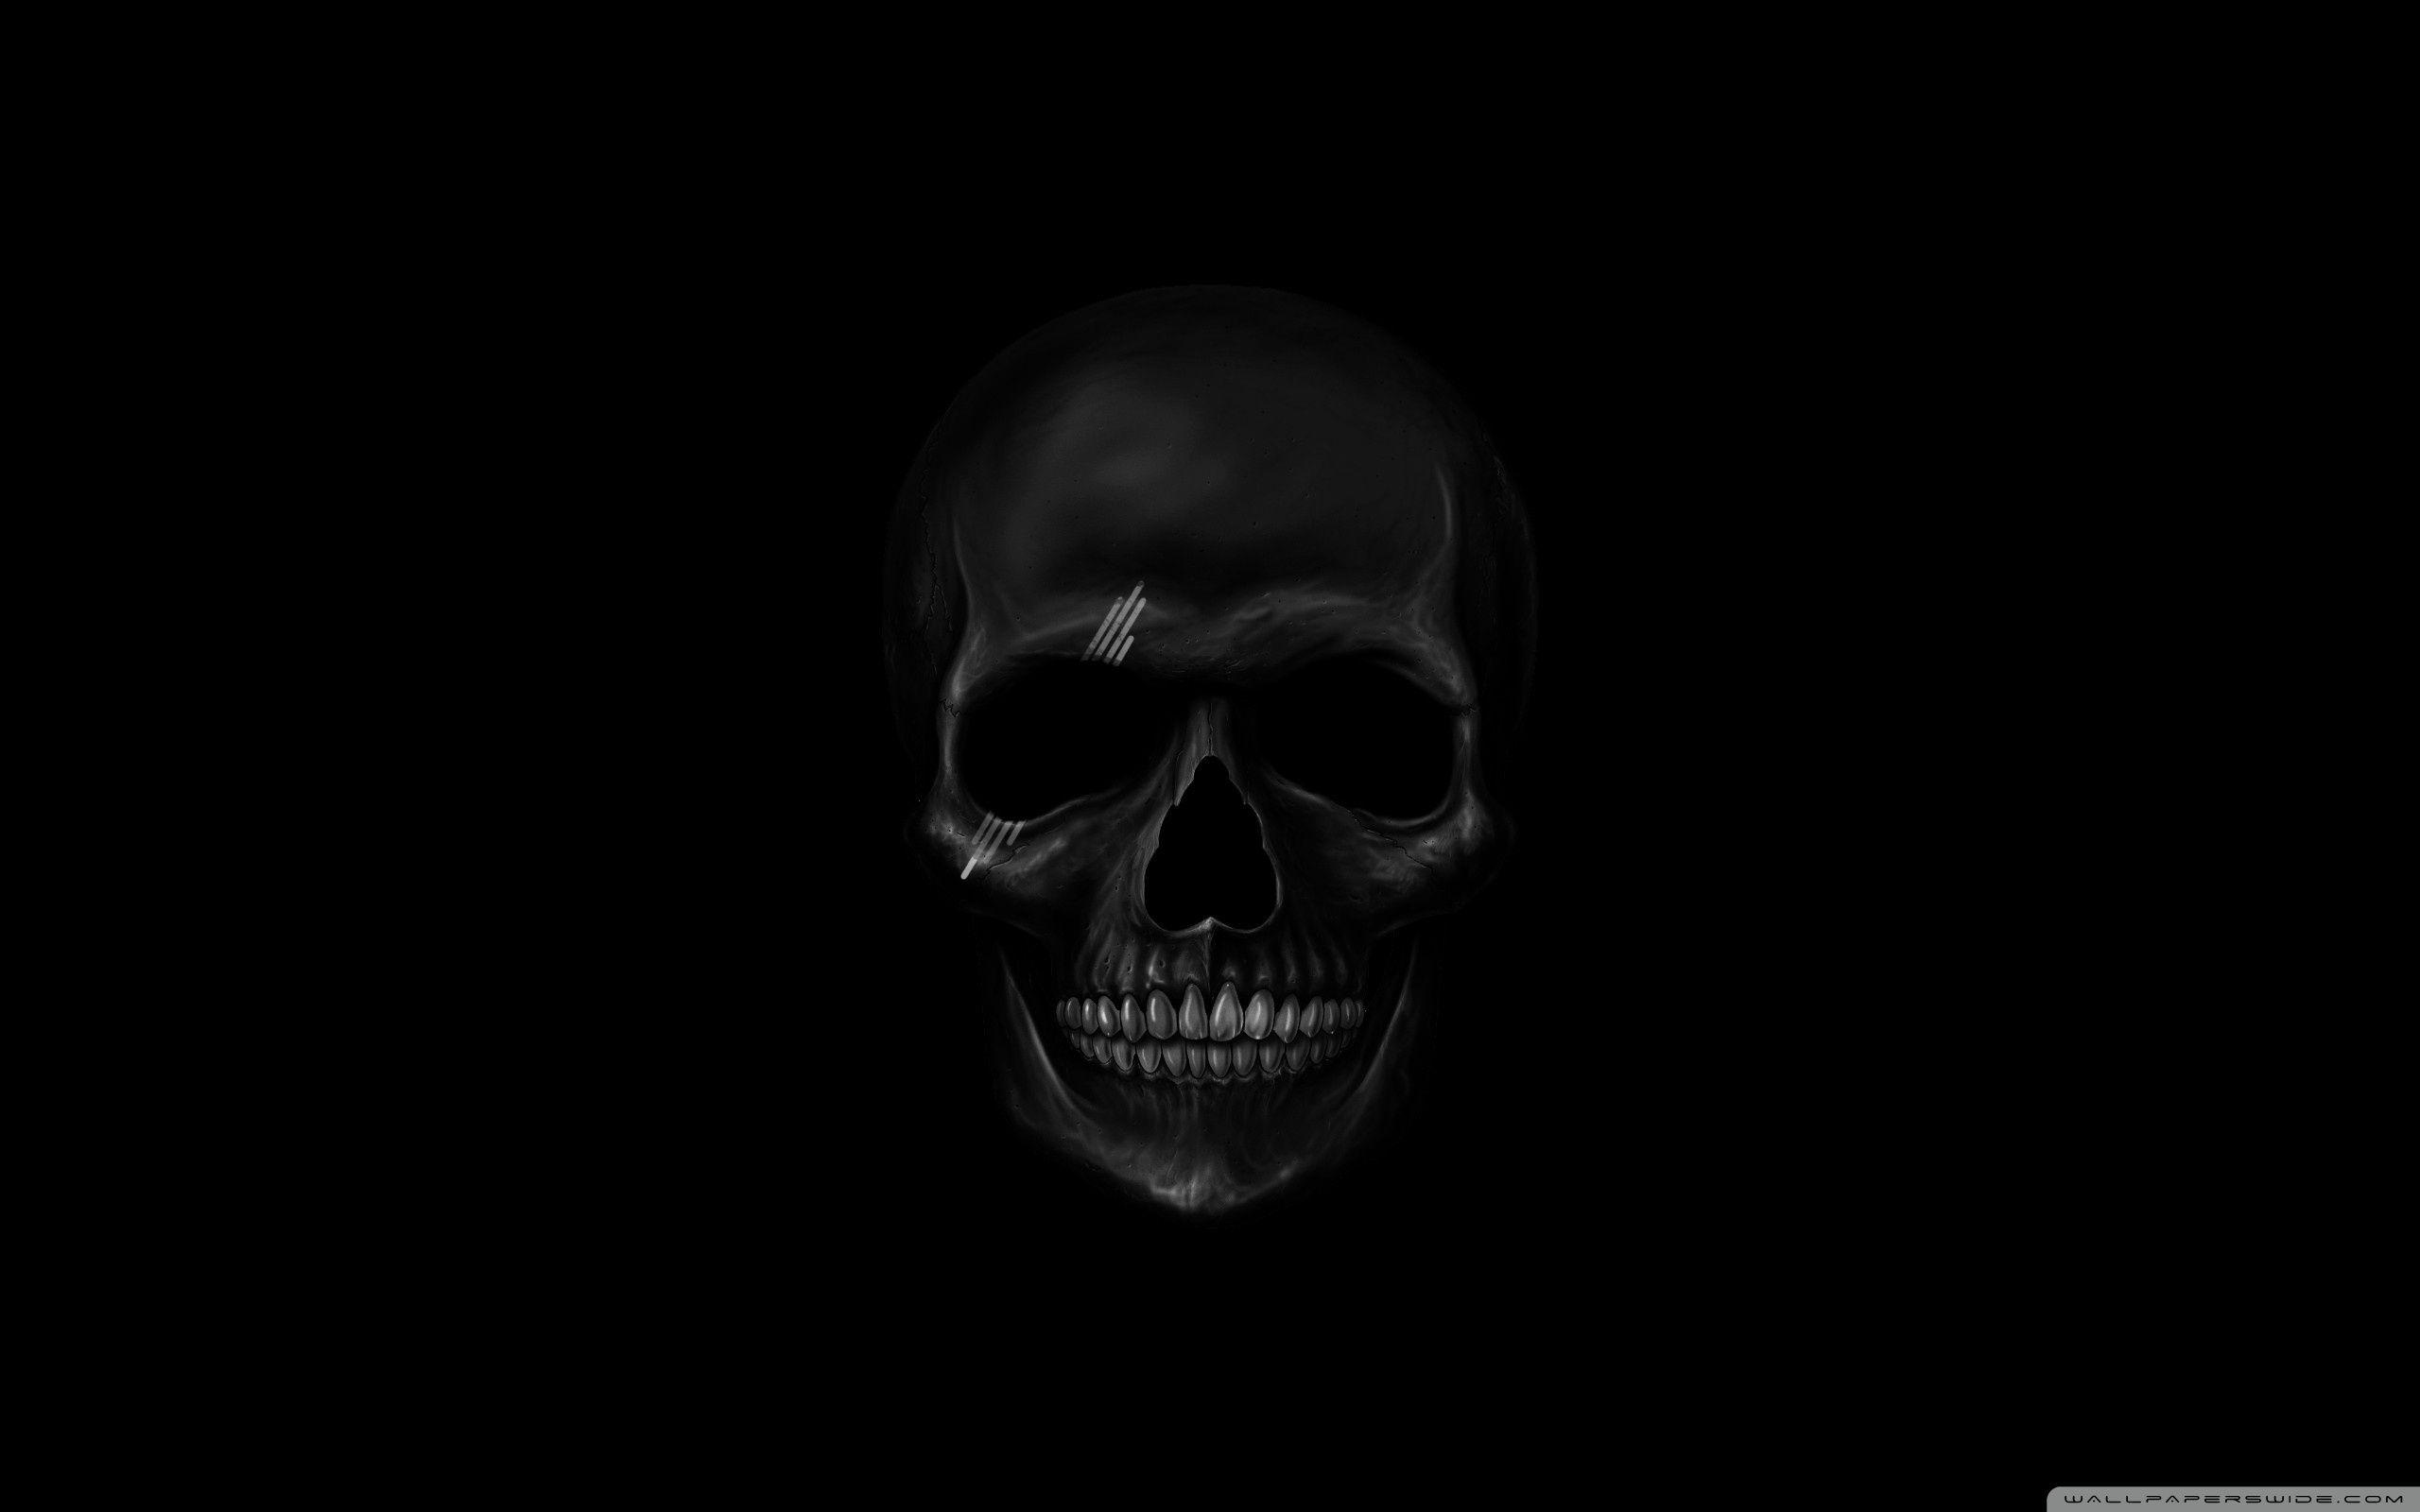 Black Wood Hd Desktop Wallpaper Widescreen High Definition Skull Wallpaper Black Hd Wallpaper Hd Skull Wallpapers